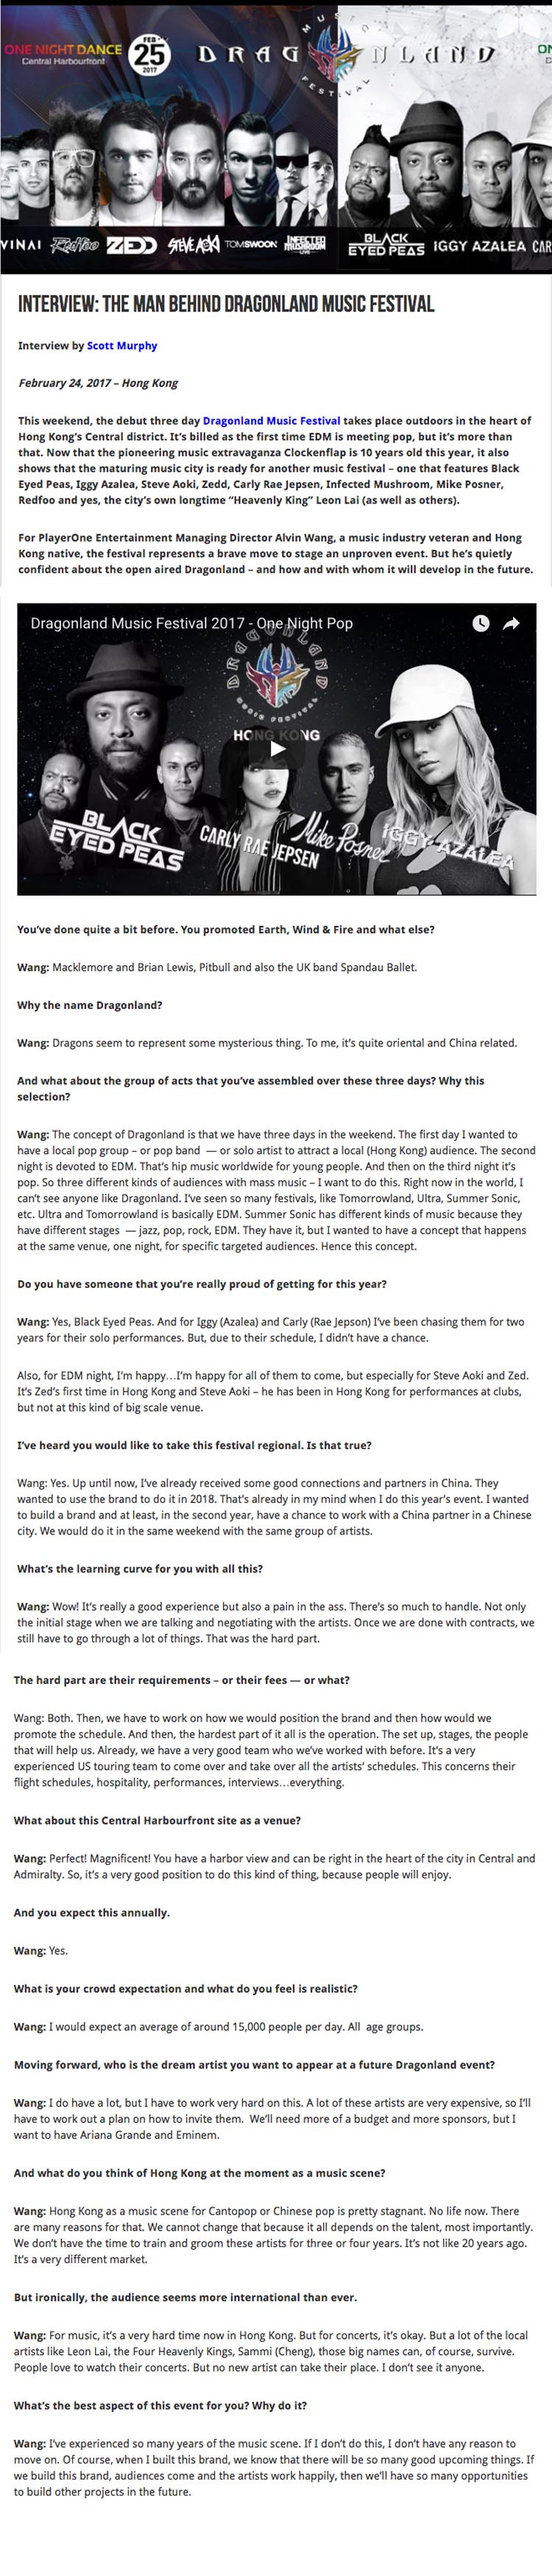 Interview The Man Behind DMF